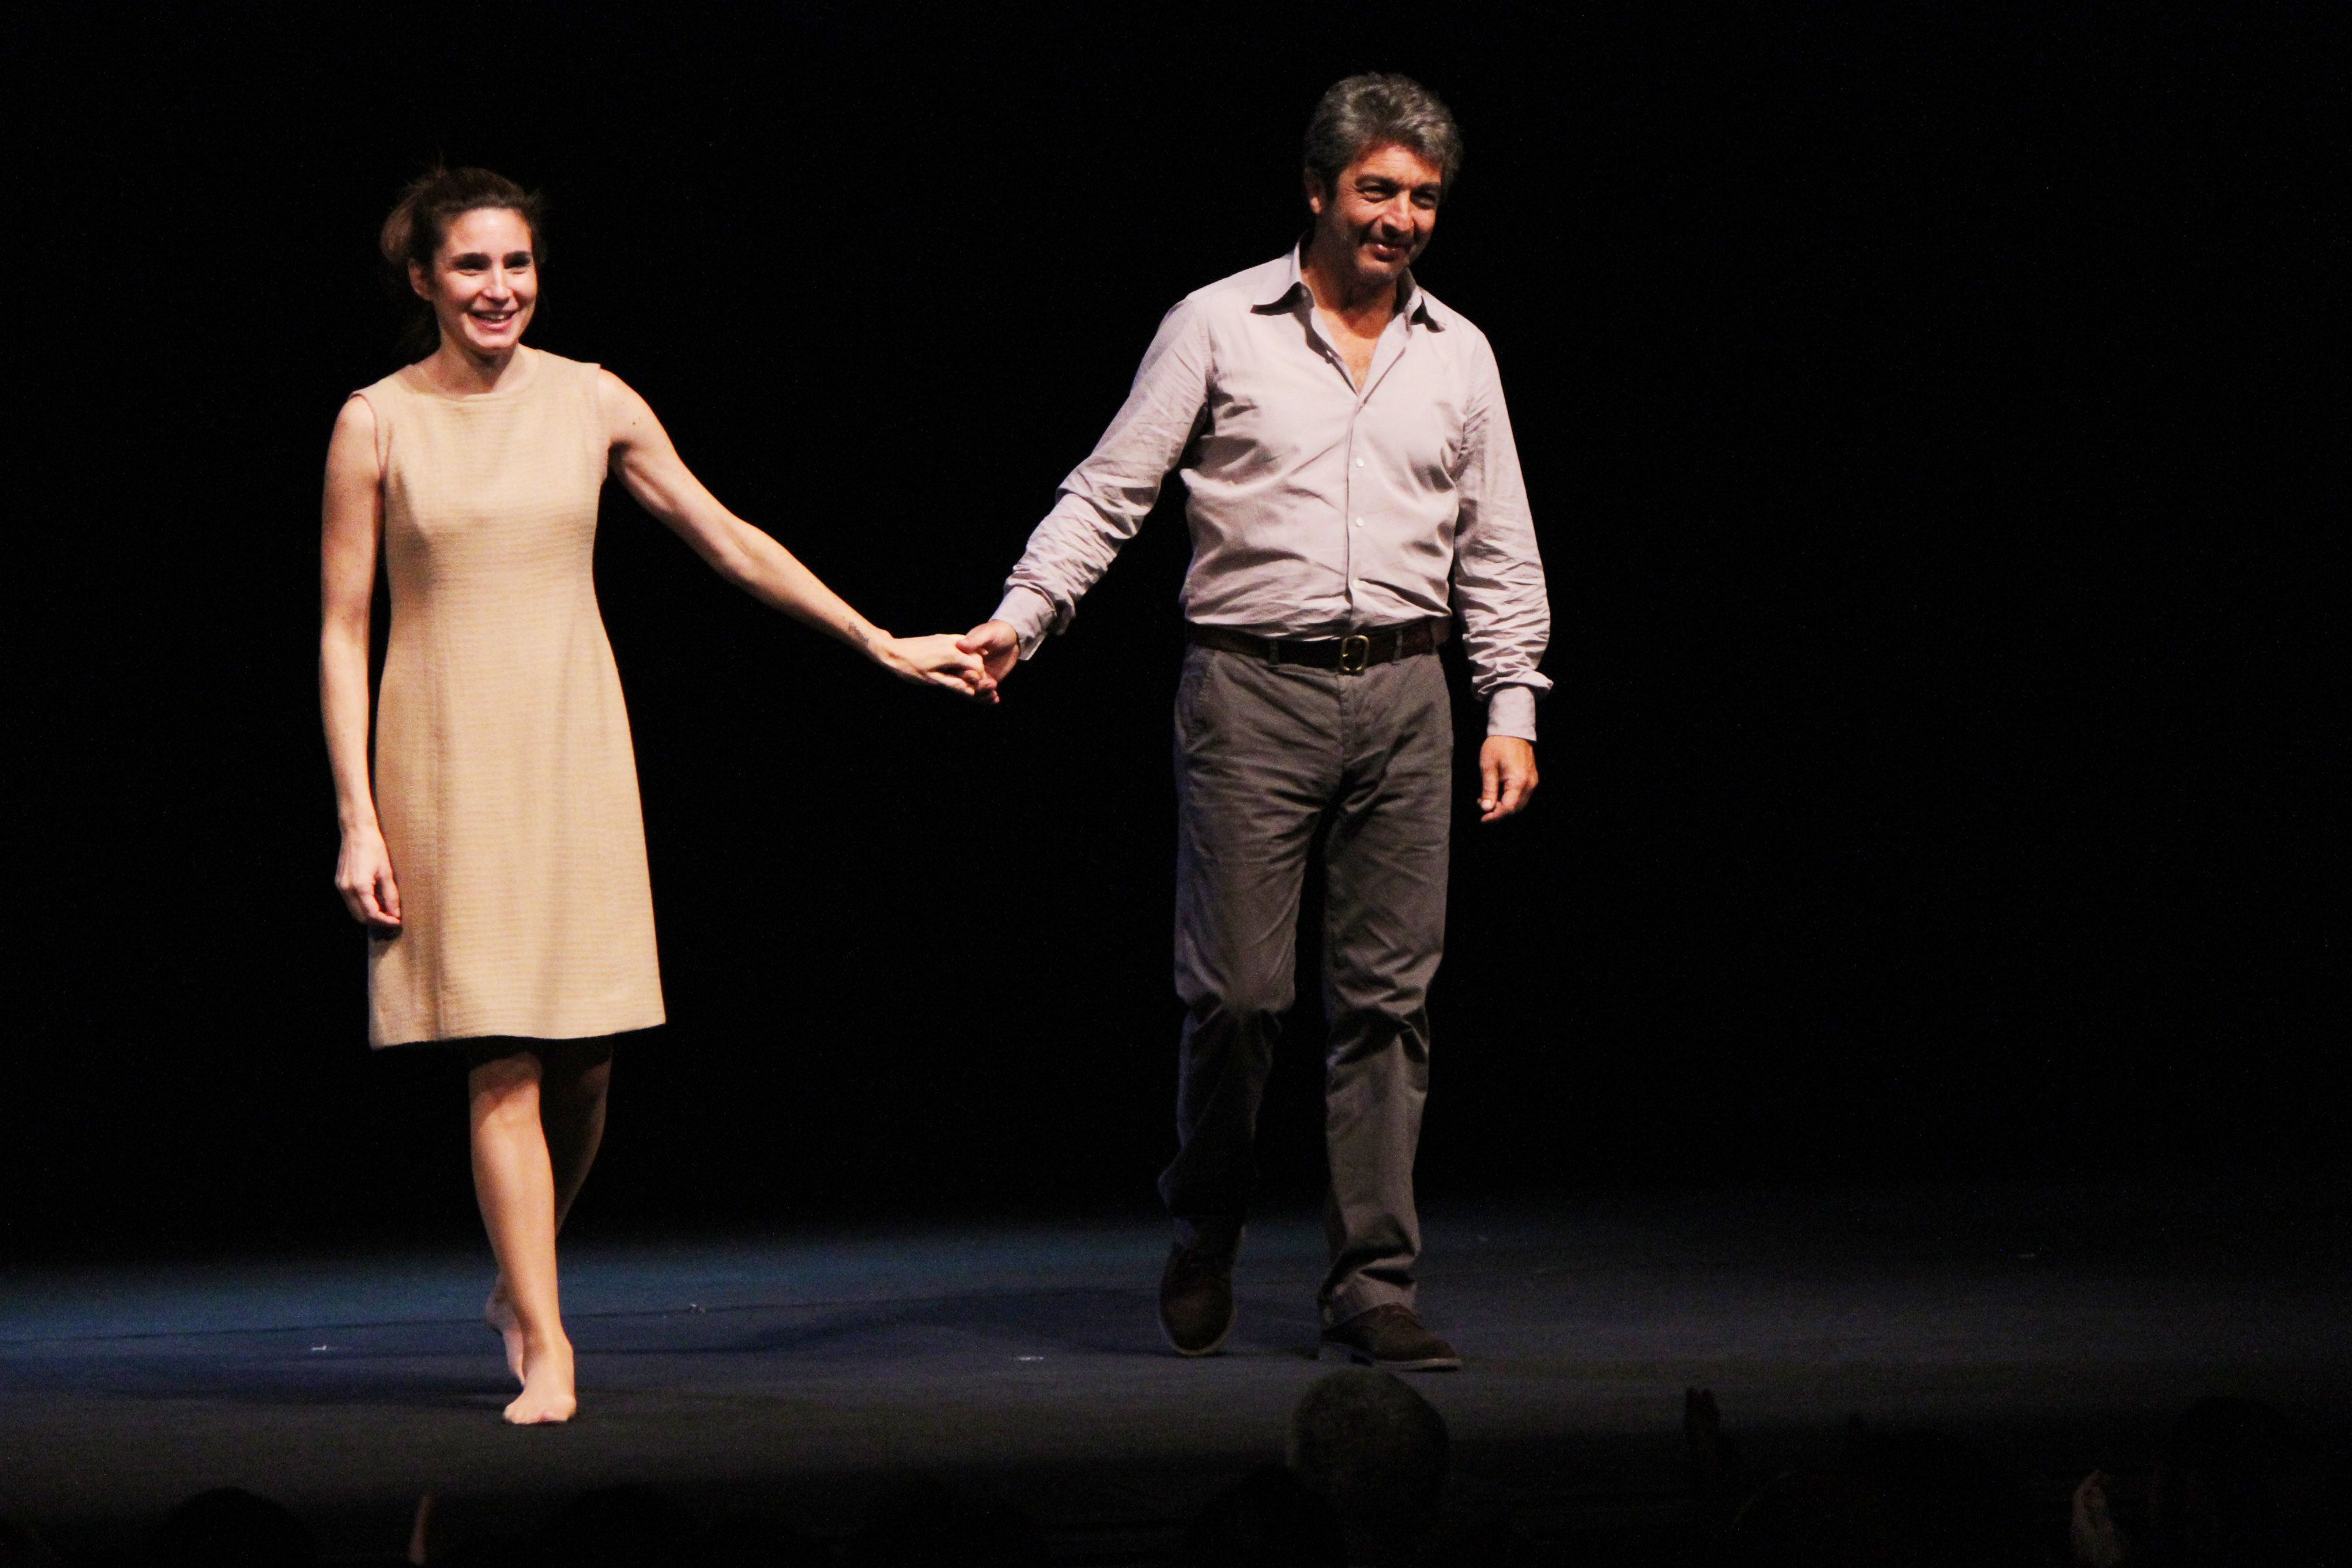 Valeria Bertuccelli y Ricardo Darín